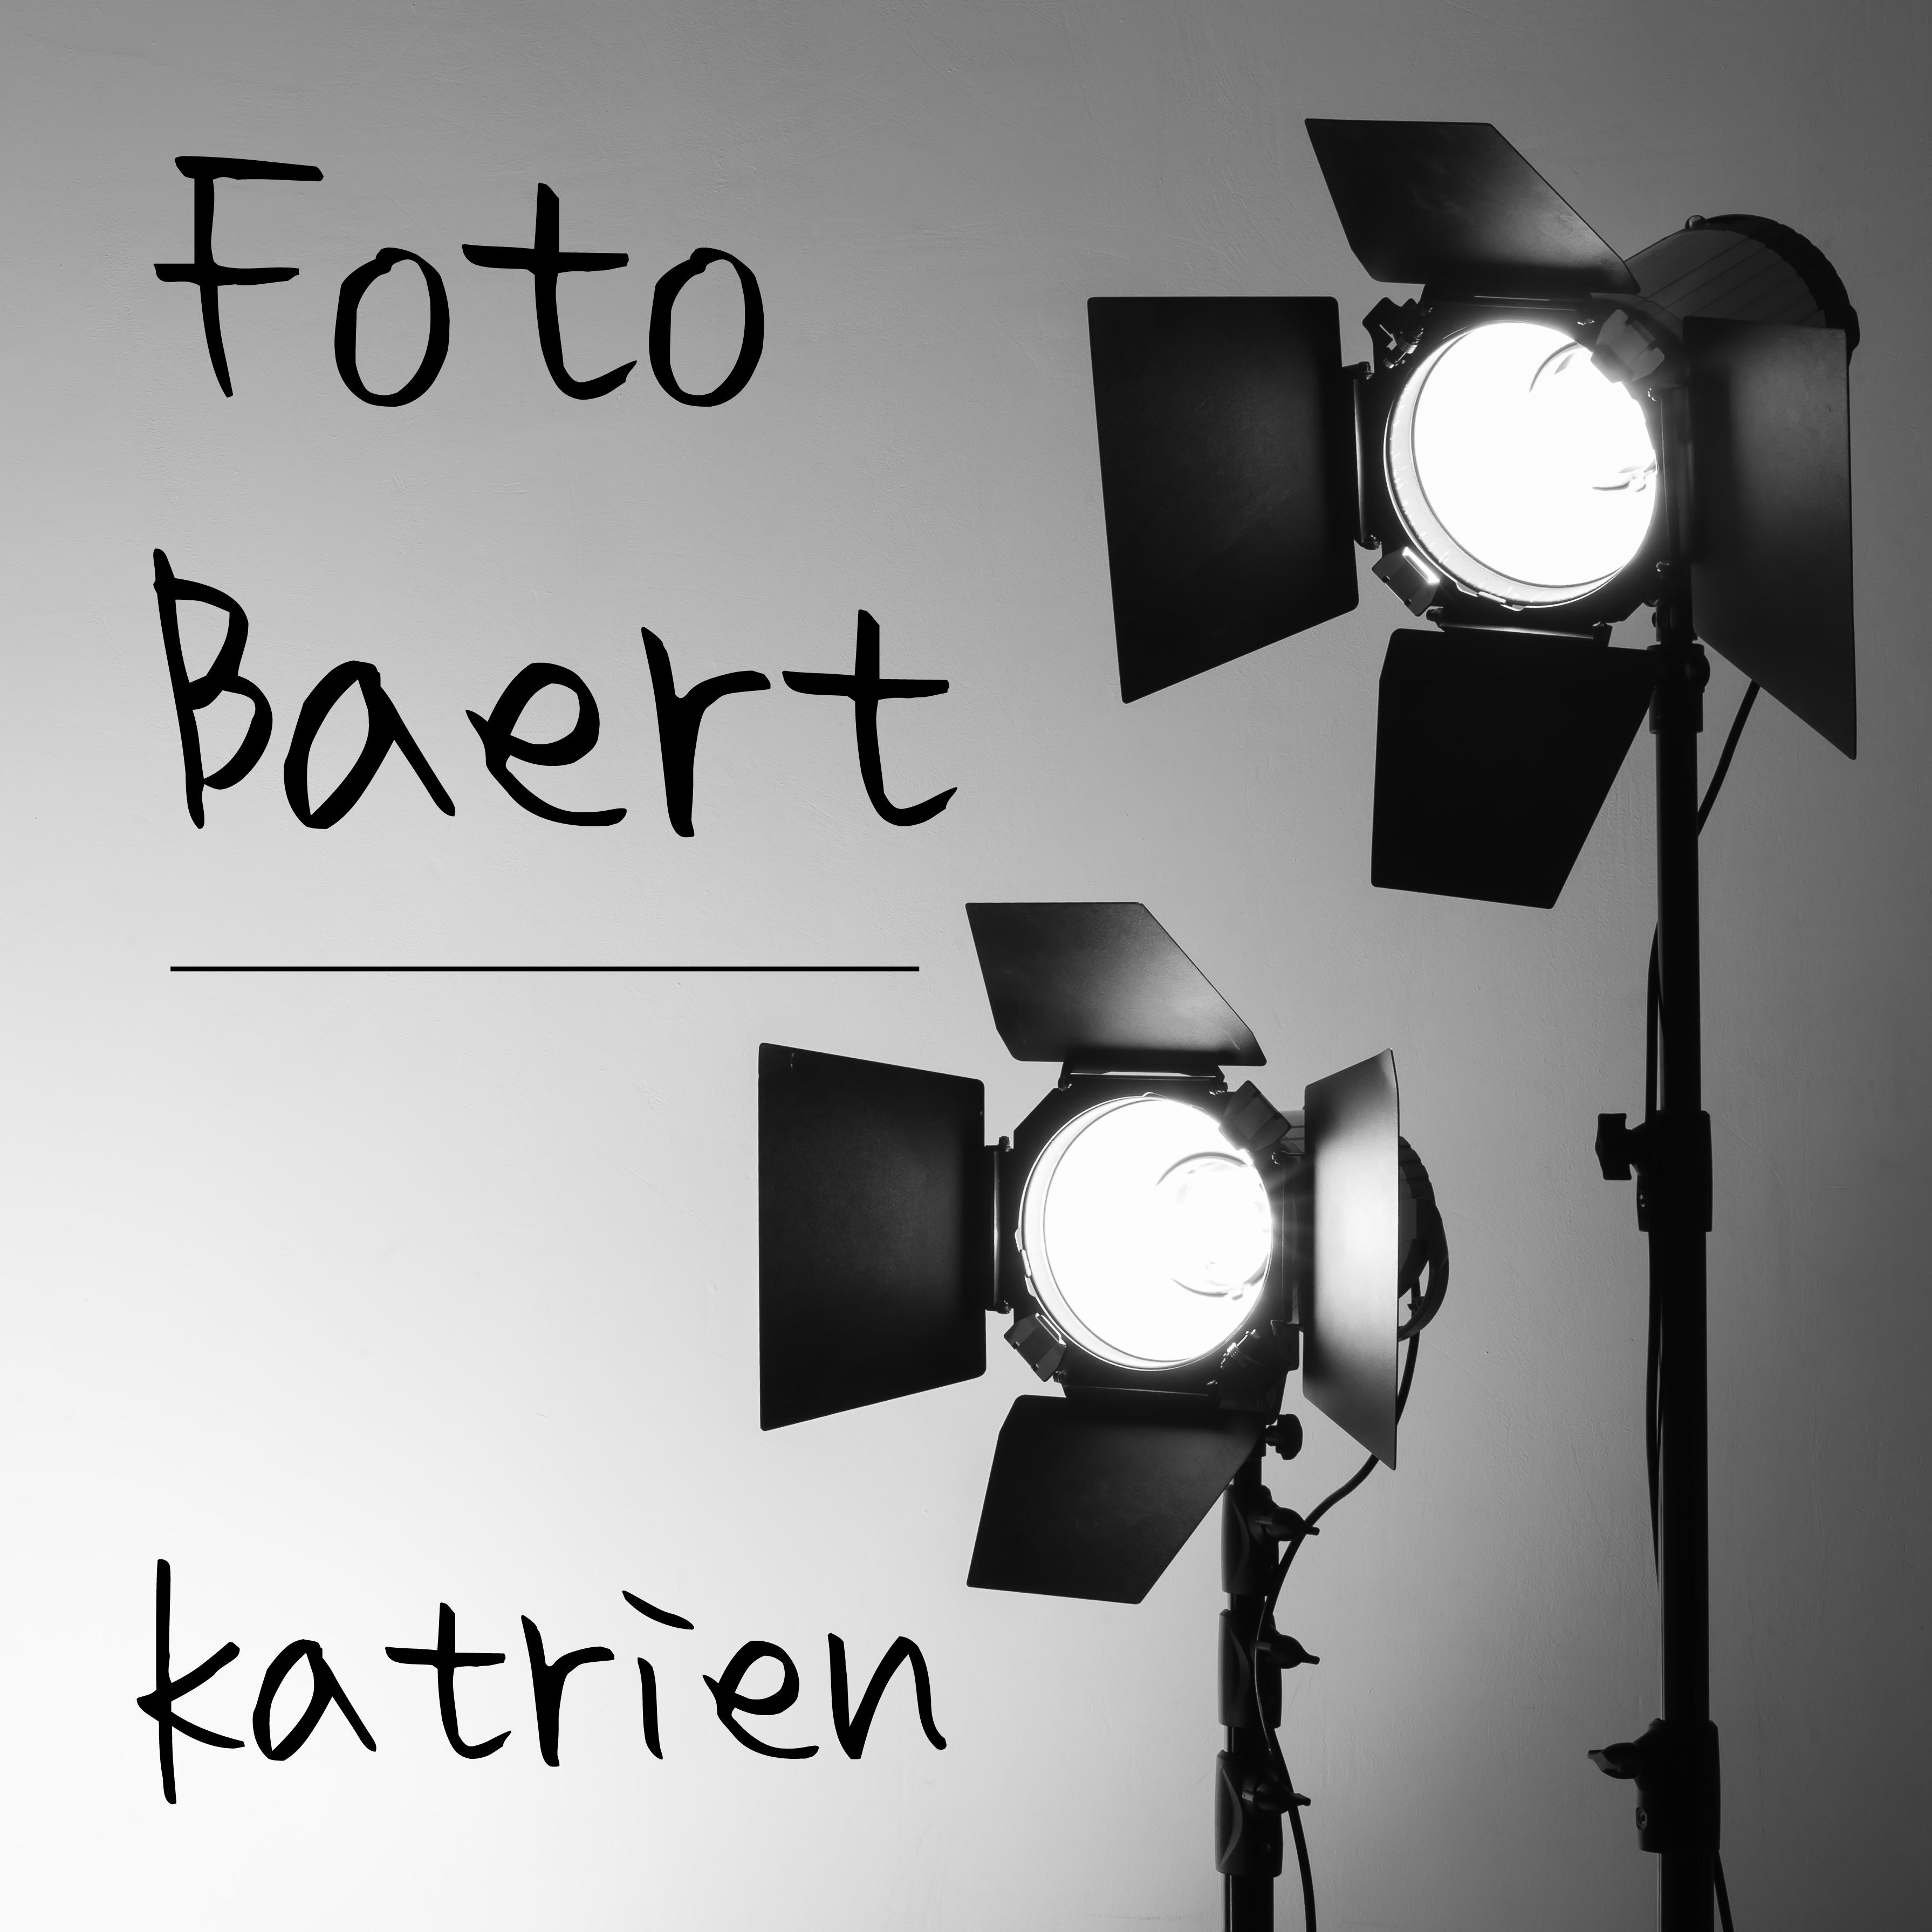 Foto Baert